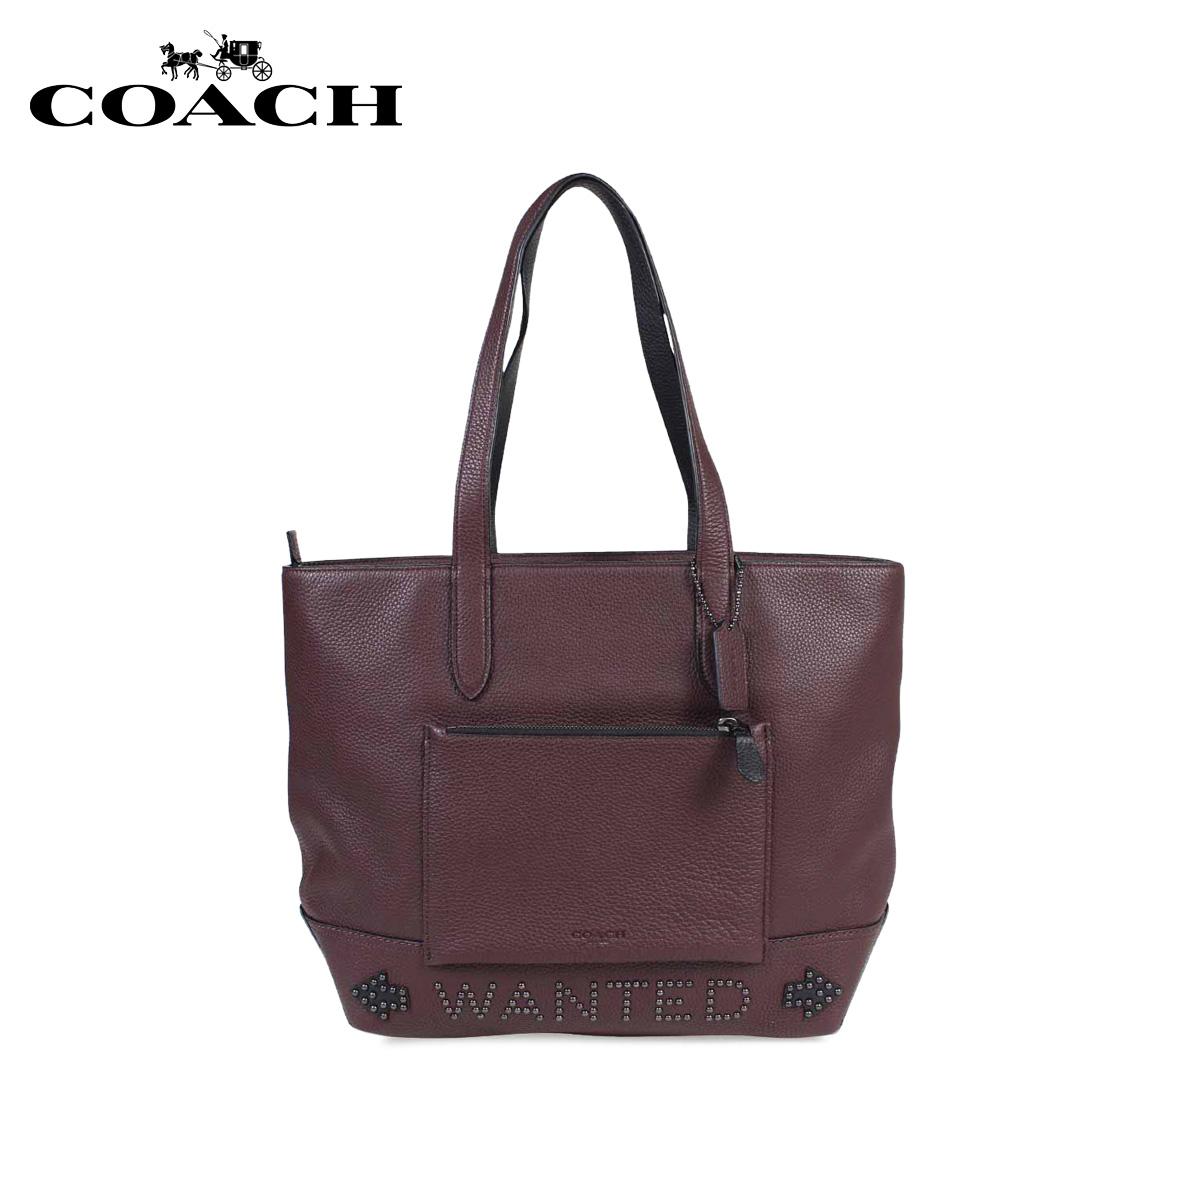 cc18e317f2111 ... top quality coach tote bag coach bag tote bag men f57774 wine red  leather 10 18 ...